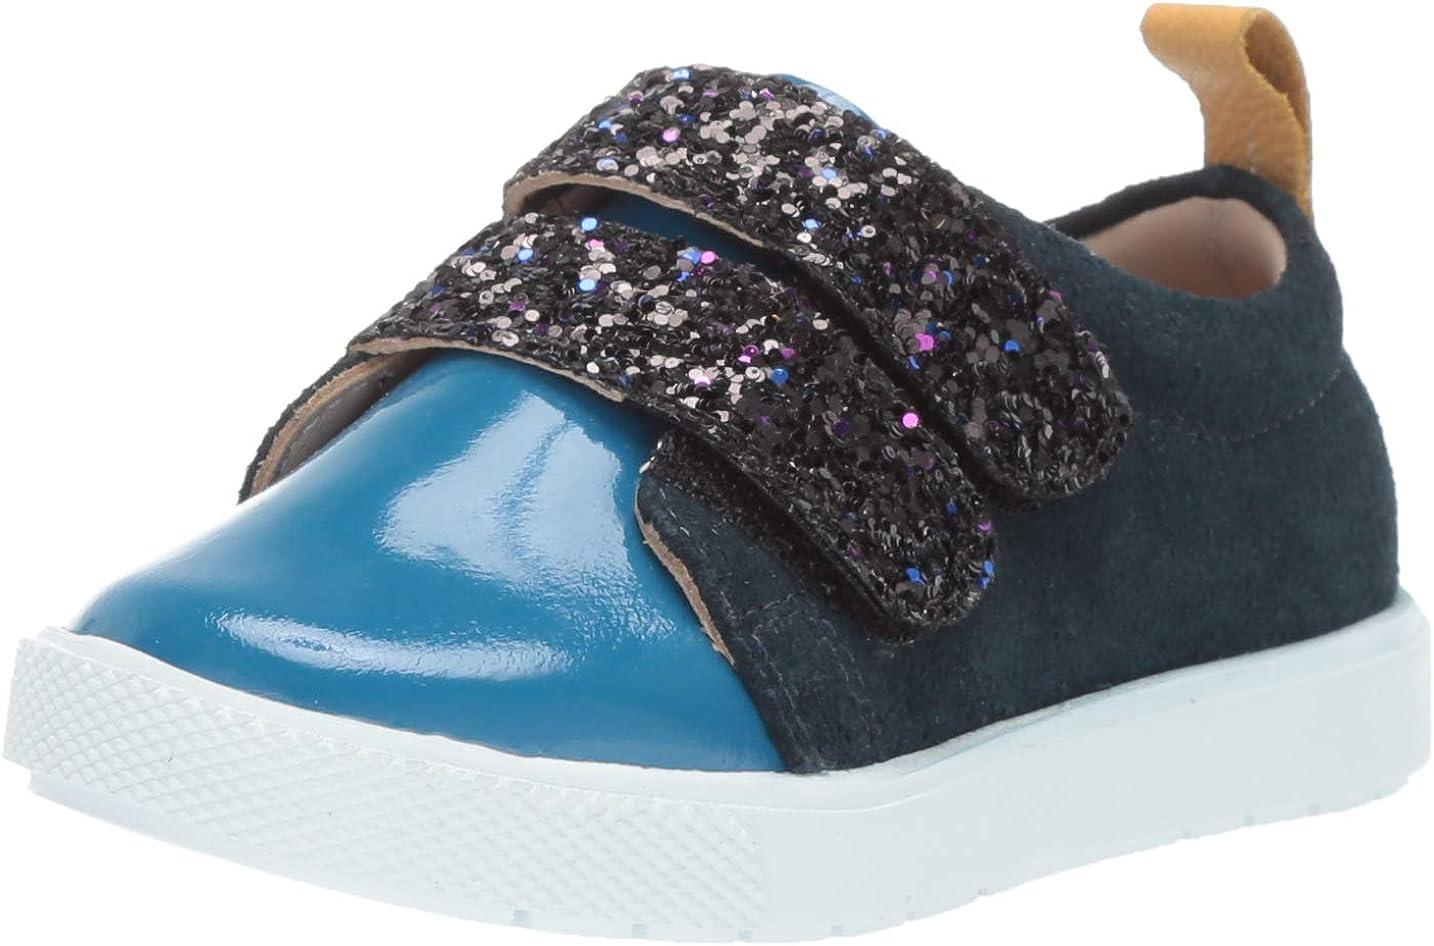 Elephantito Unisex-Child Act4me Sneaker